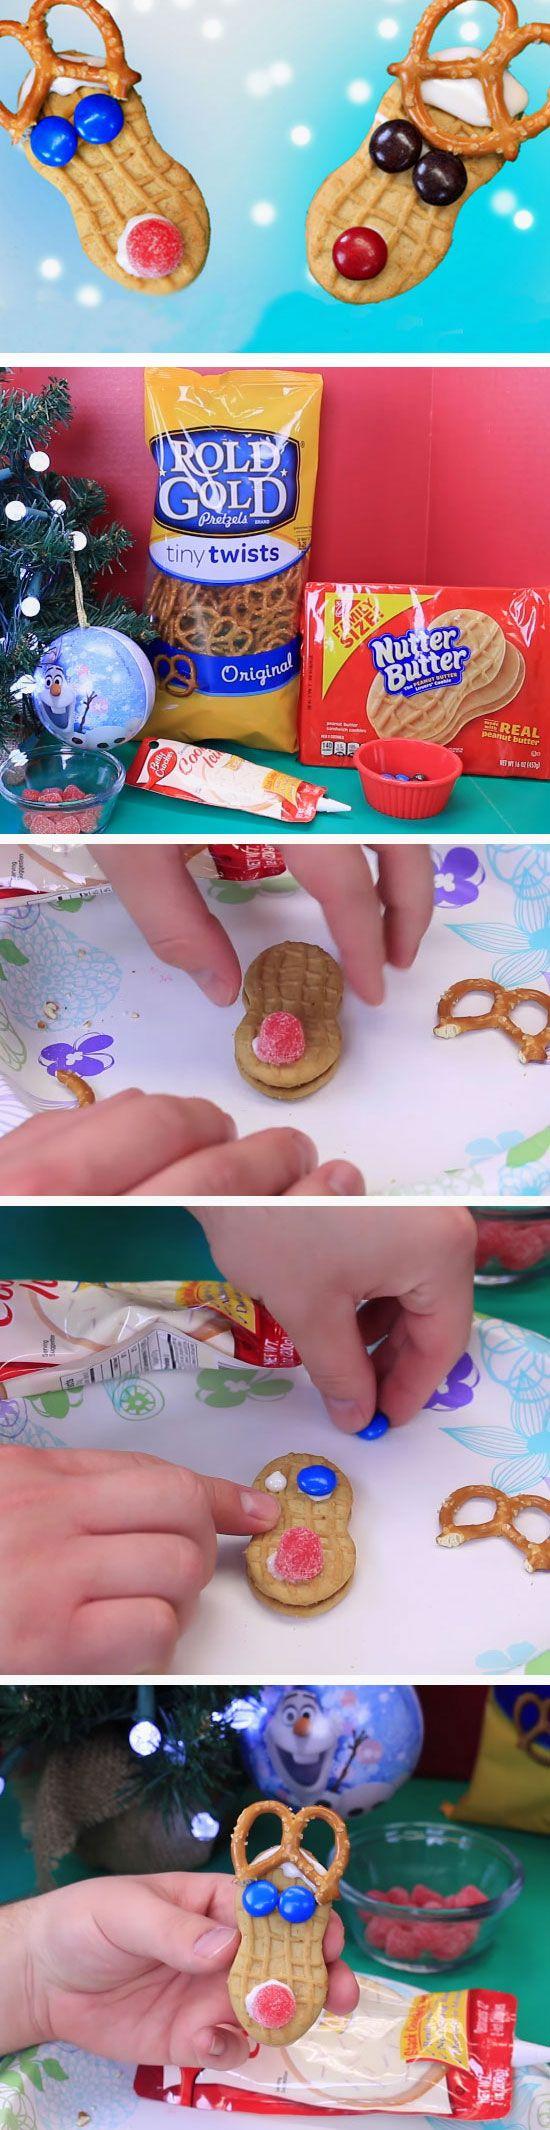 Reindeer Cookies | 20+ DIY Christmas Crafts for Kids to Make